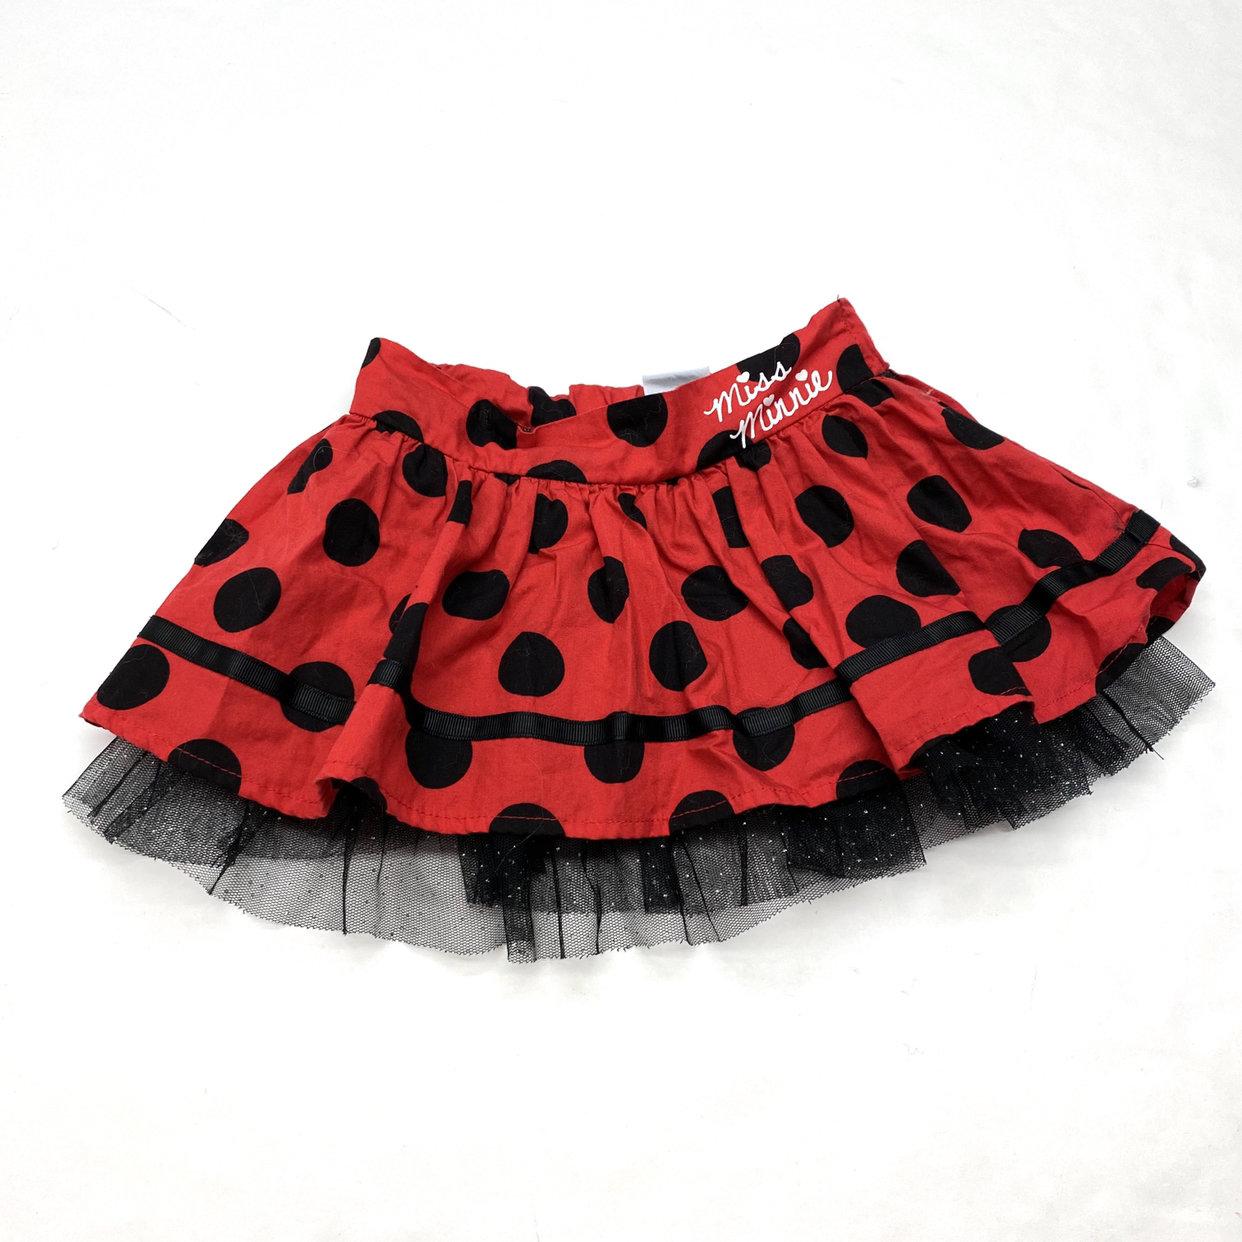 Minnie Mouse Tutu Skirt 12-18 Months